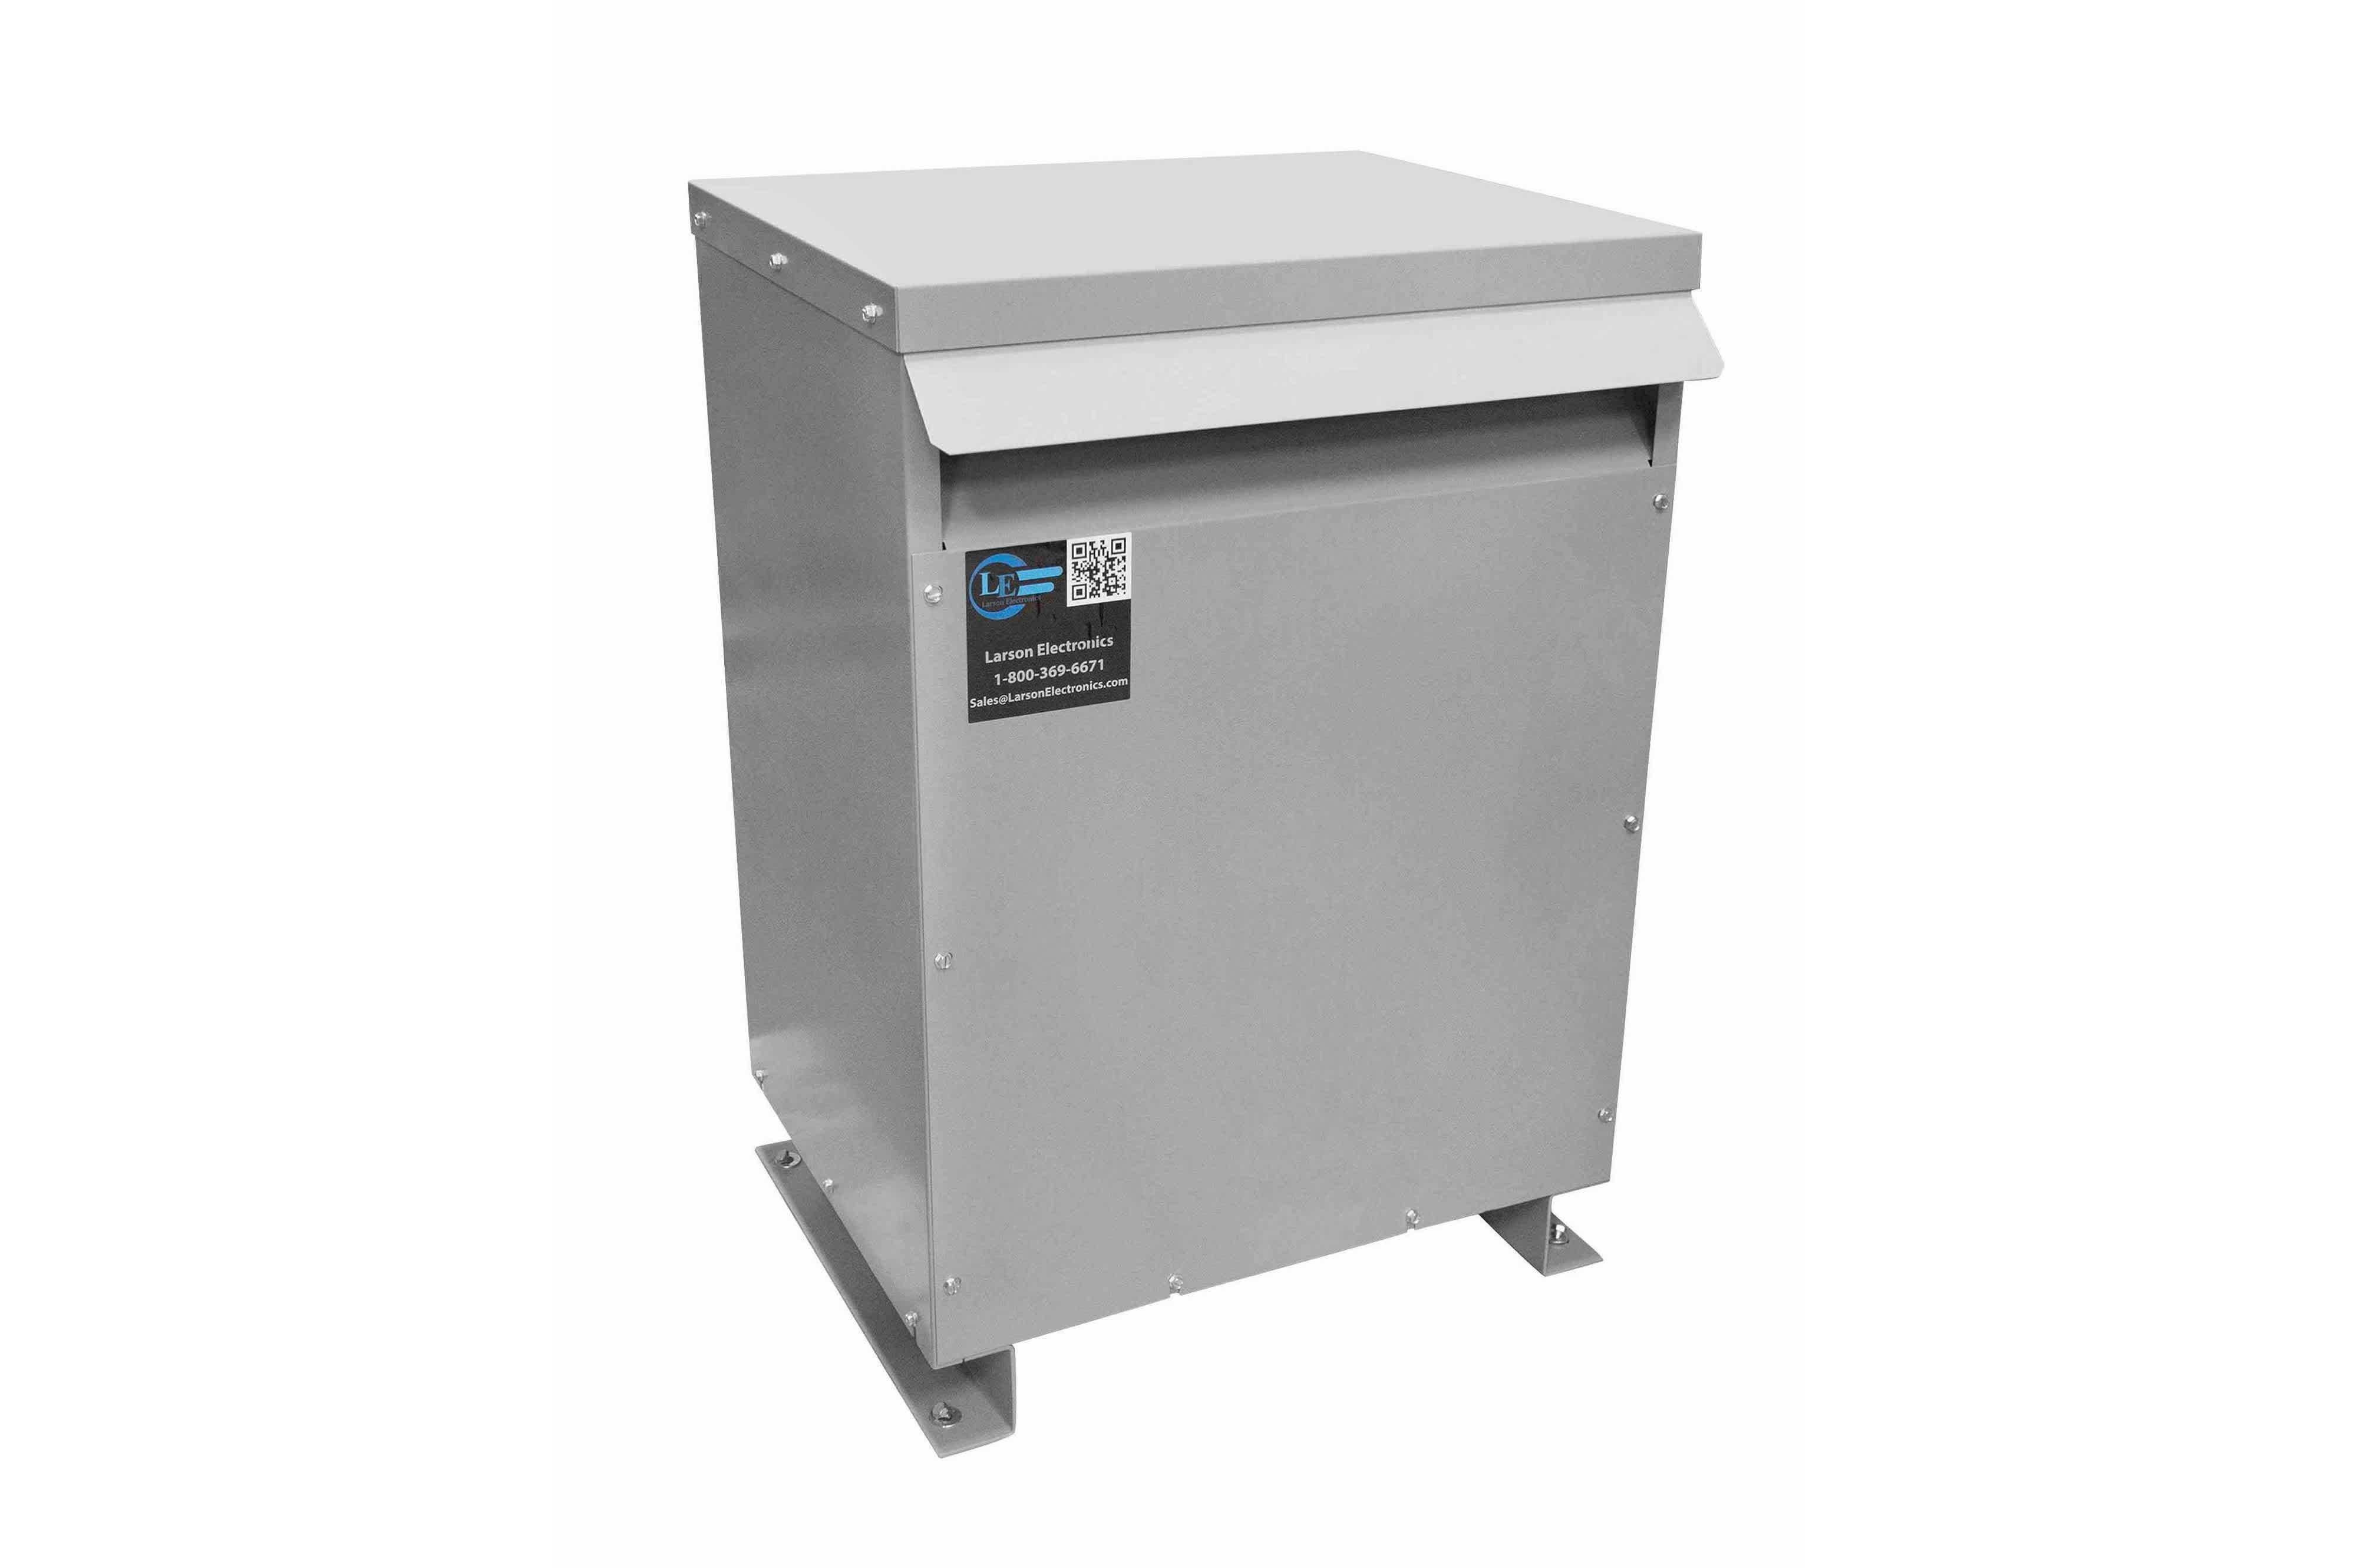 45 kVA 3PH DOE Transformer, 460V Delta Primary, 208Y/120 Wye-N Secondary, N3R, Ventilated, 60 Hz